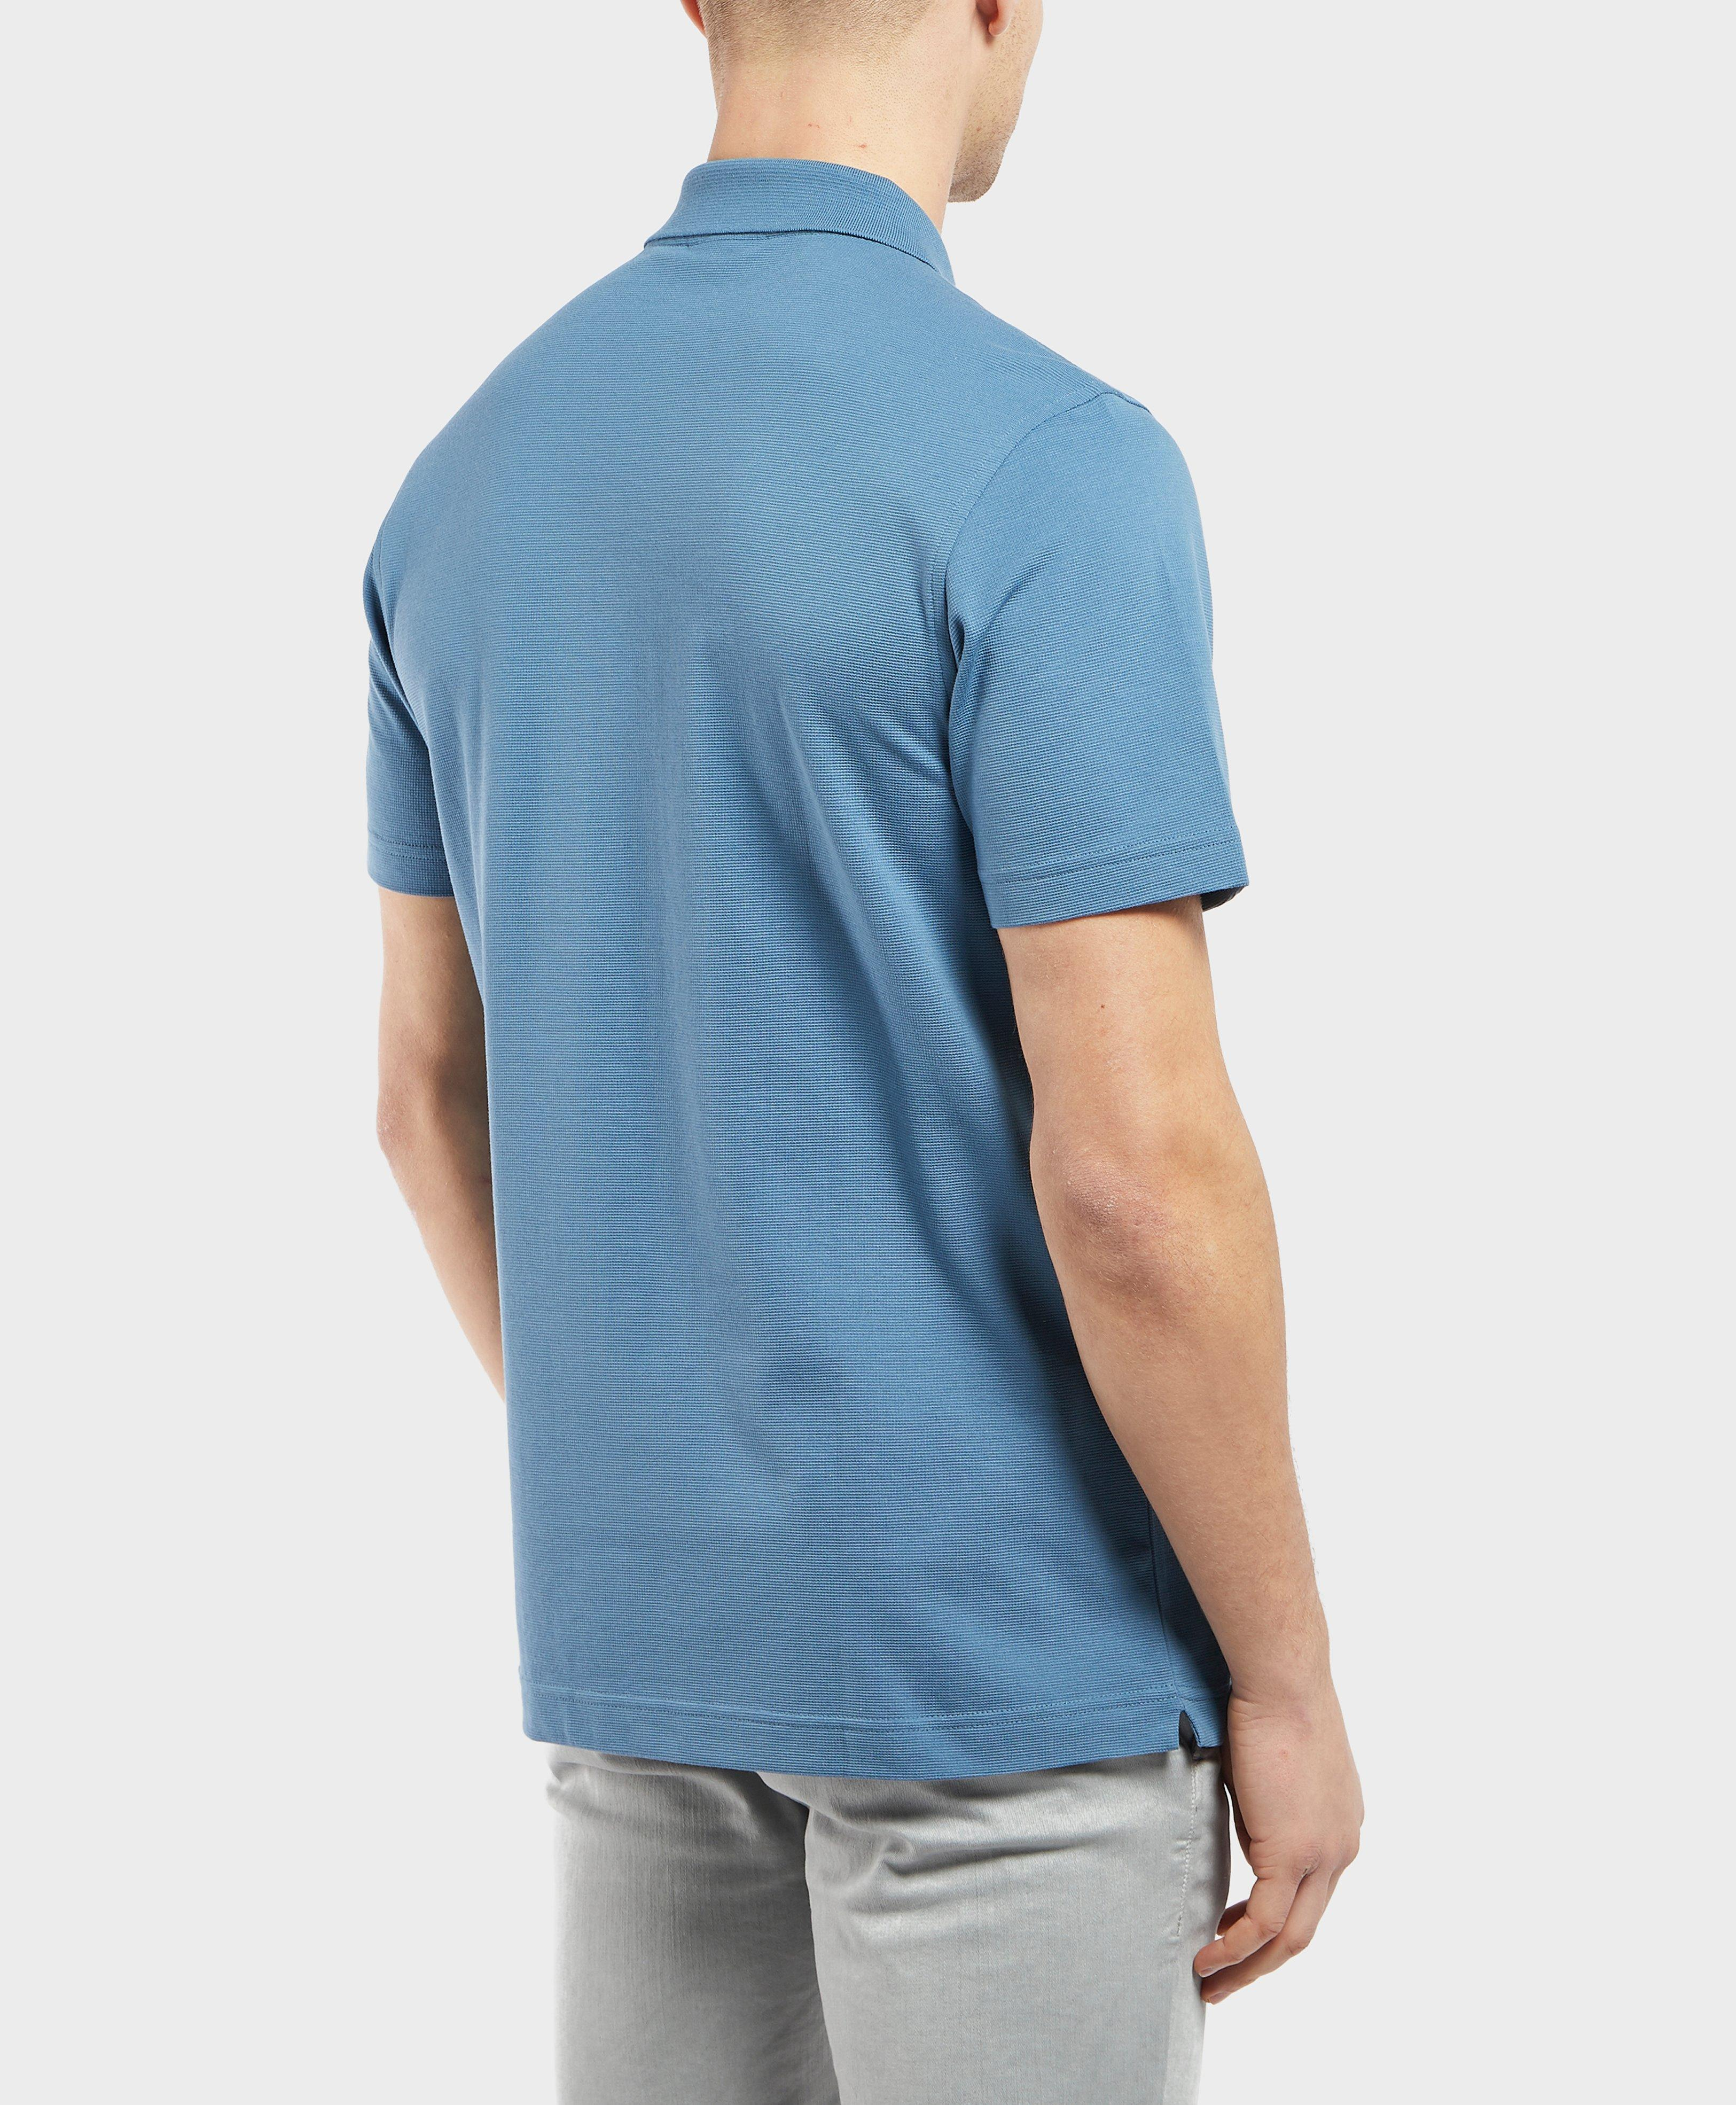 abd2141f Lyst - Lacoste Alligator Short Sleeve Polo Shirt in Blue for Men